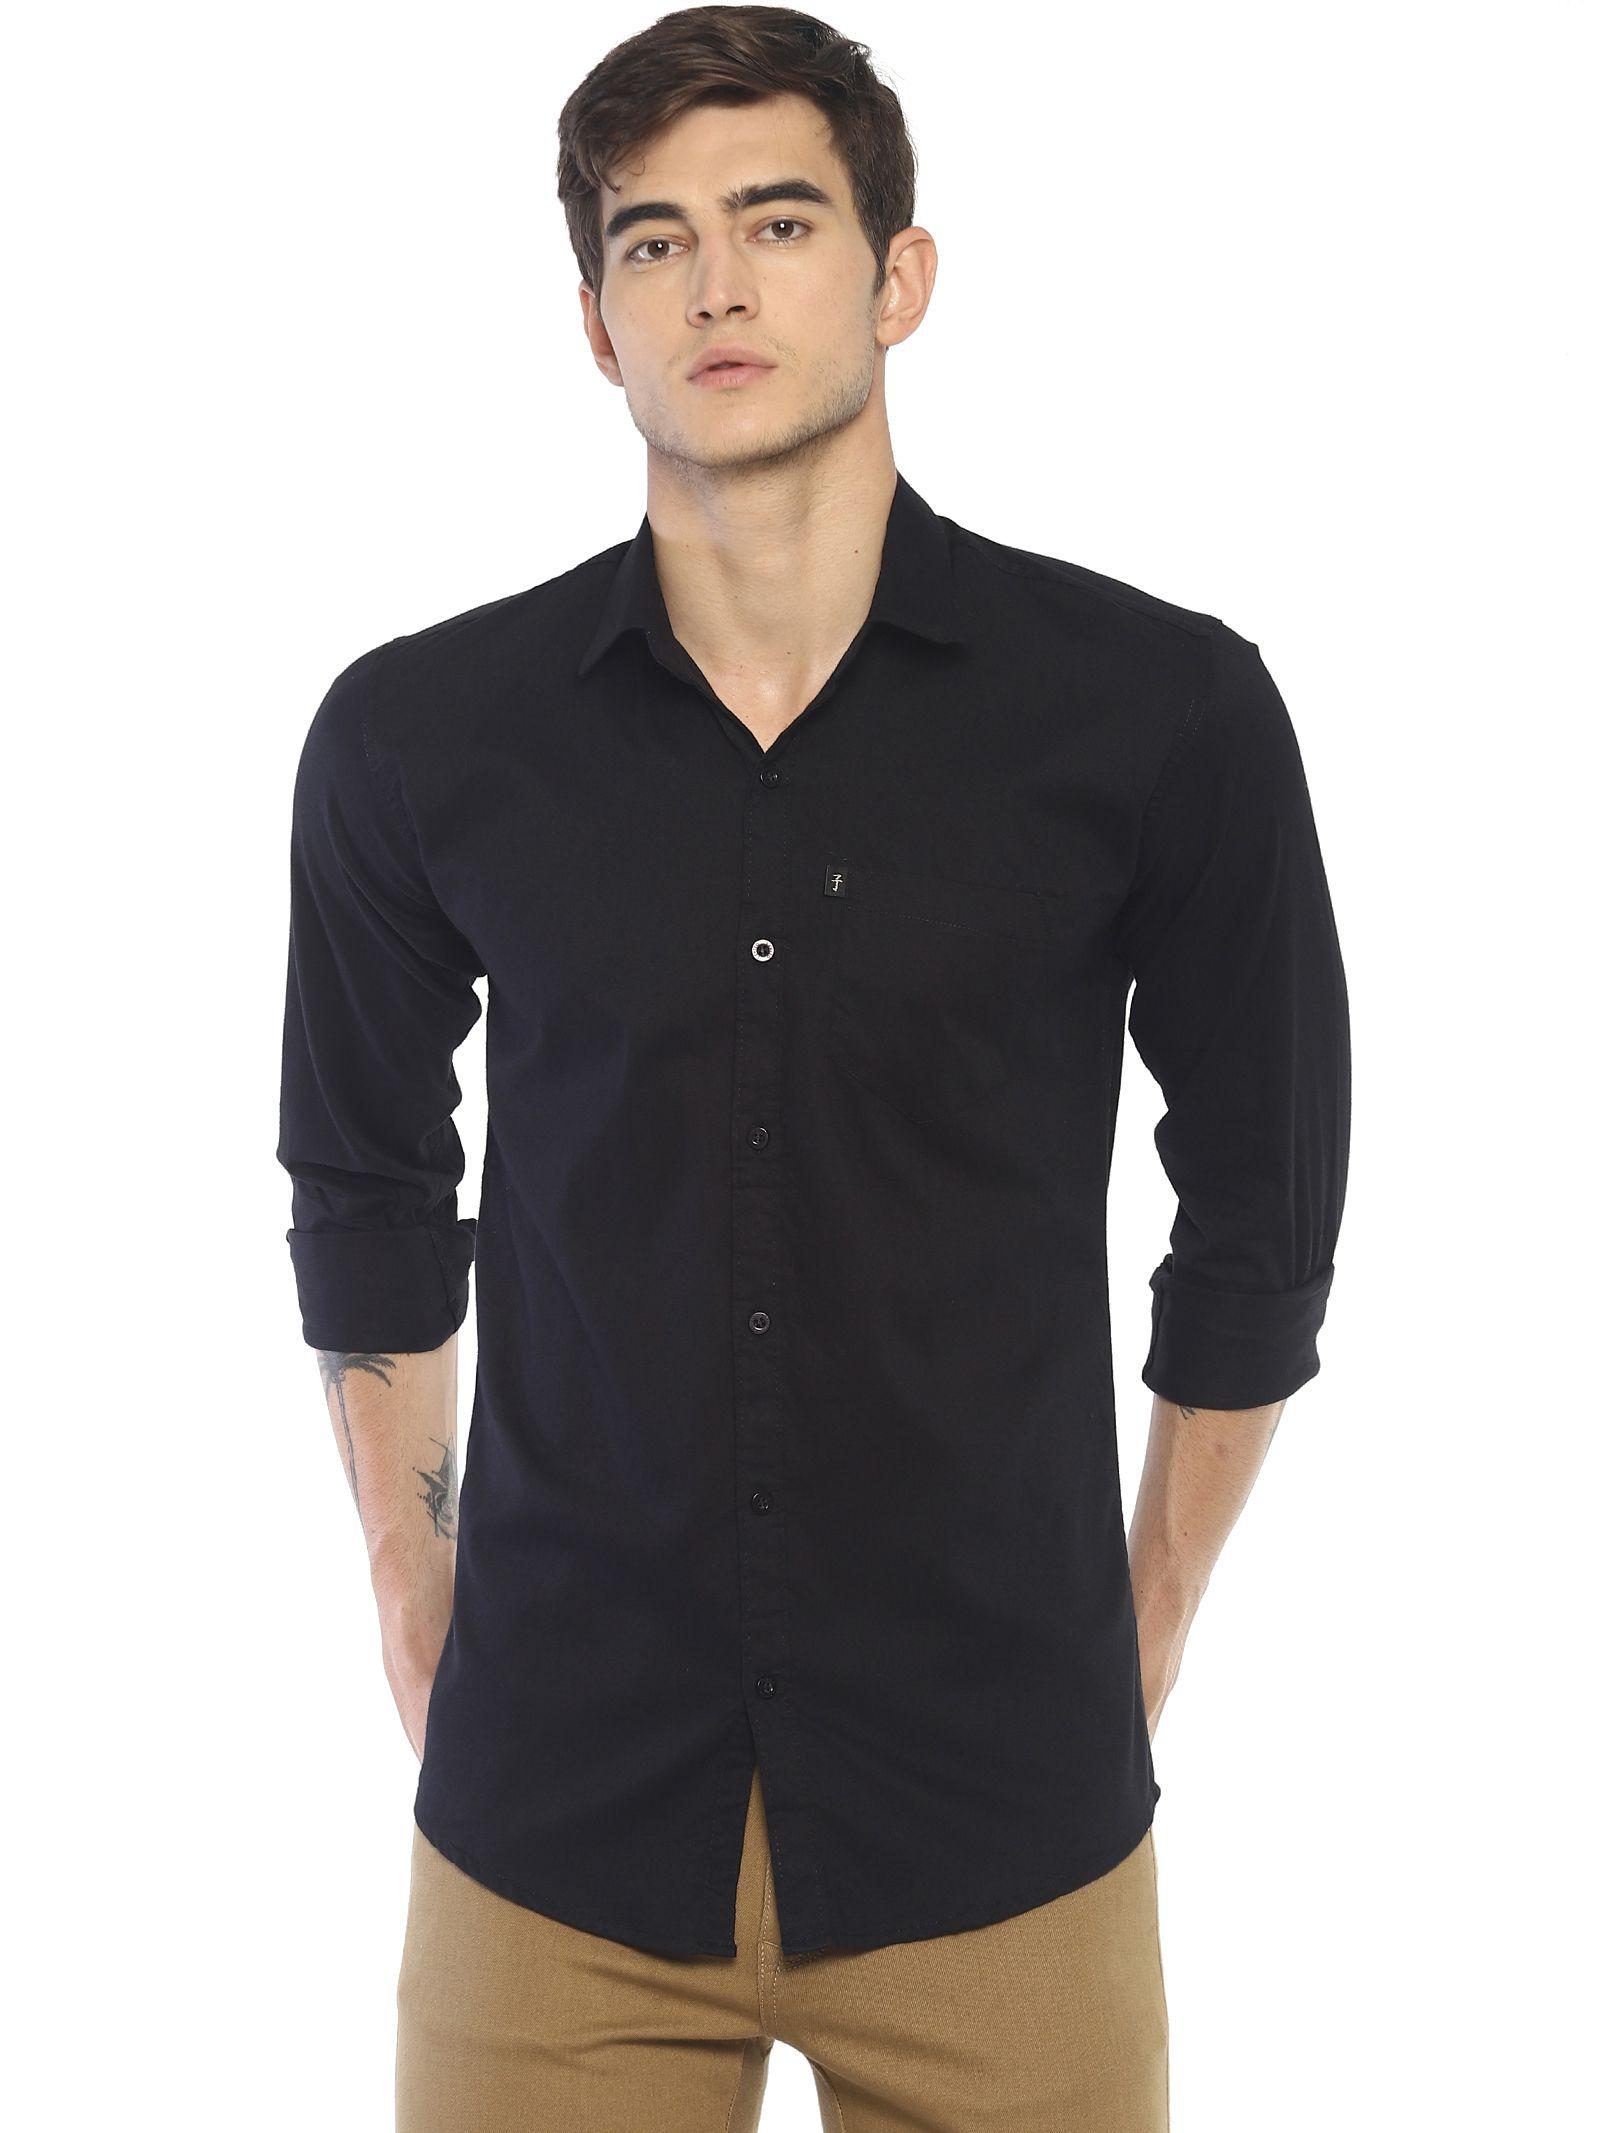 Levizo 100 Percent Cotton Black Solids Shirt